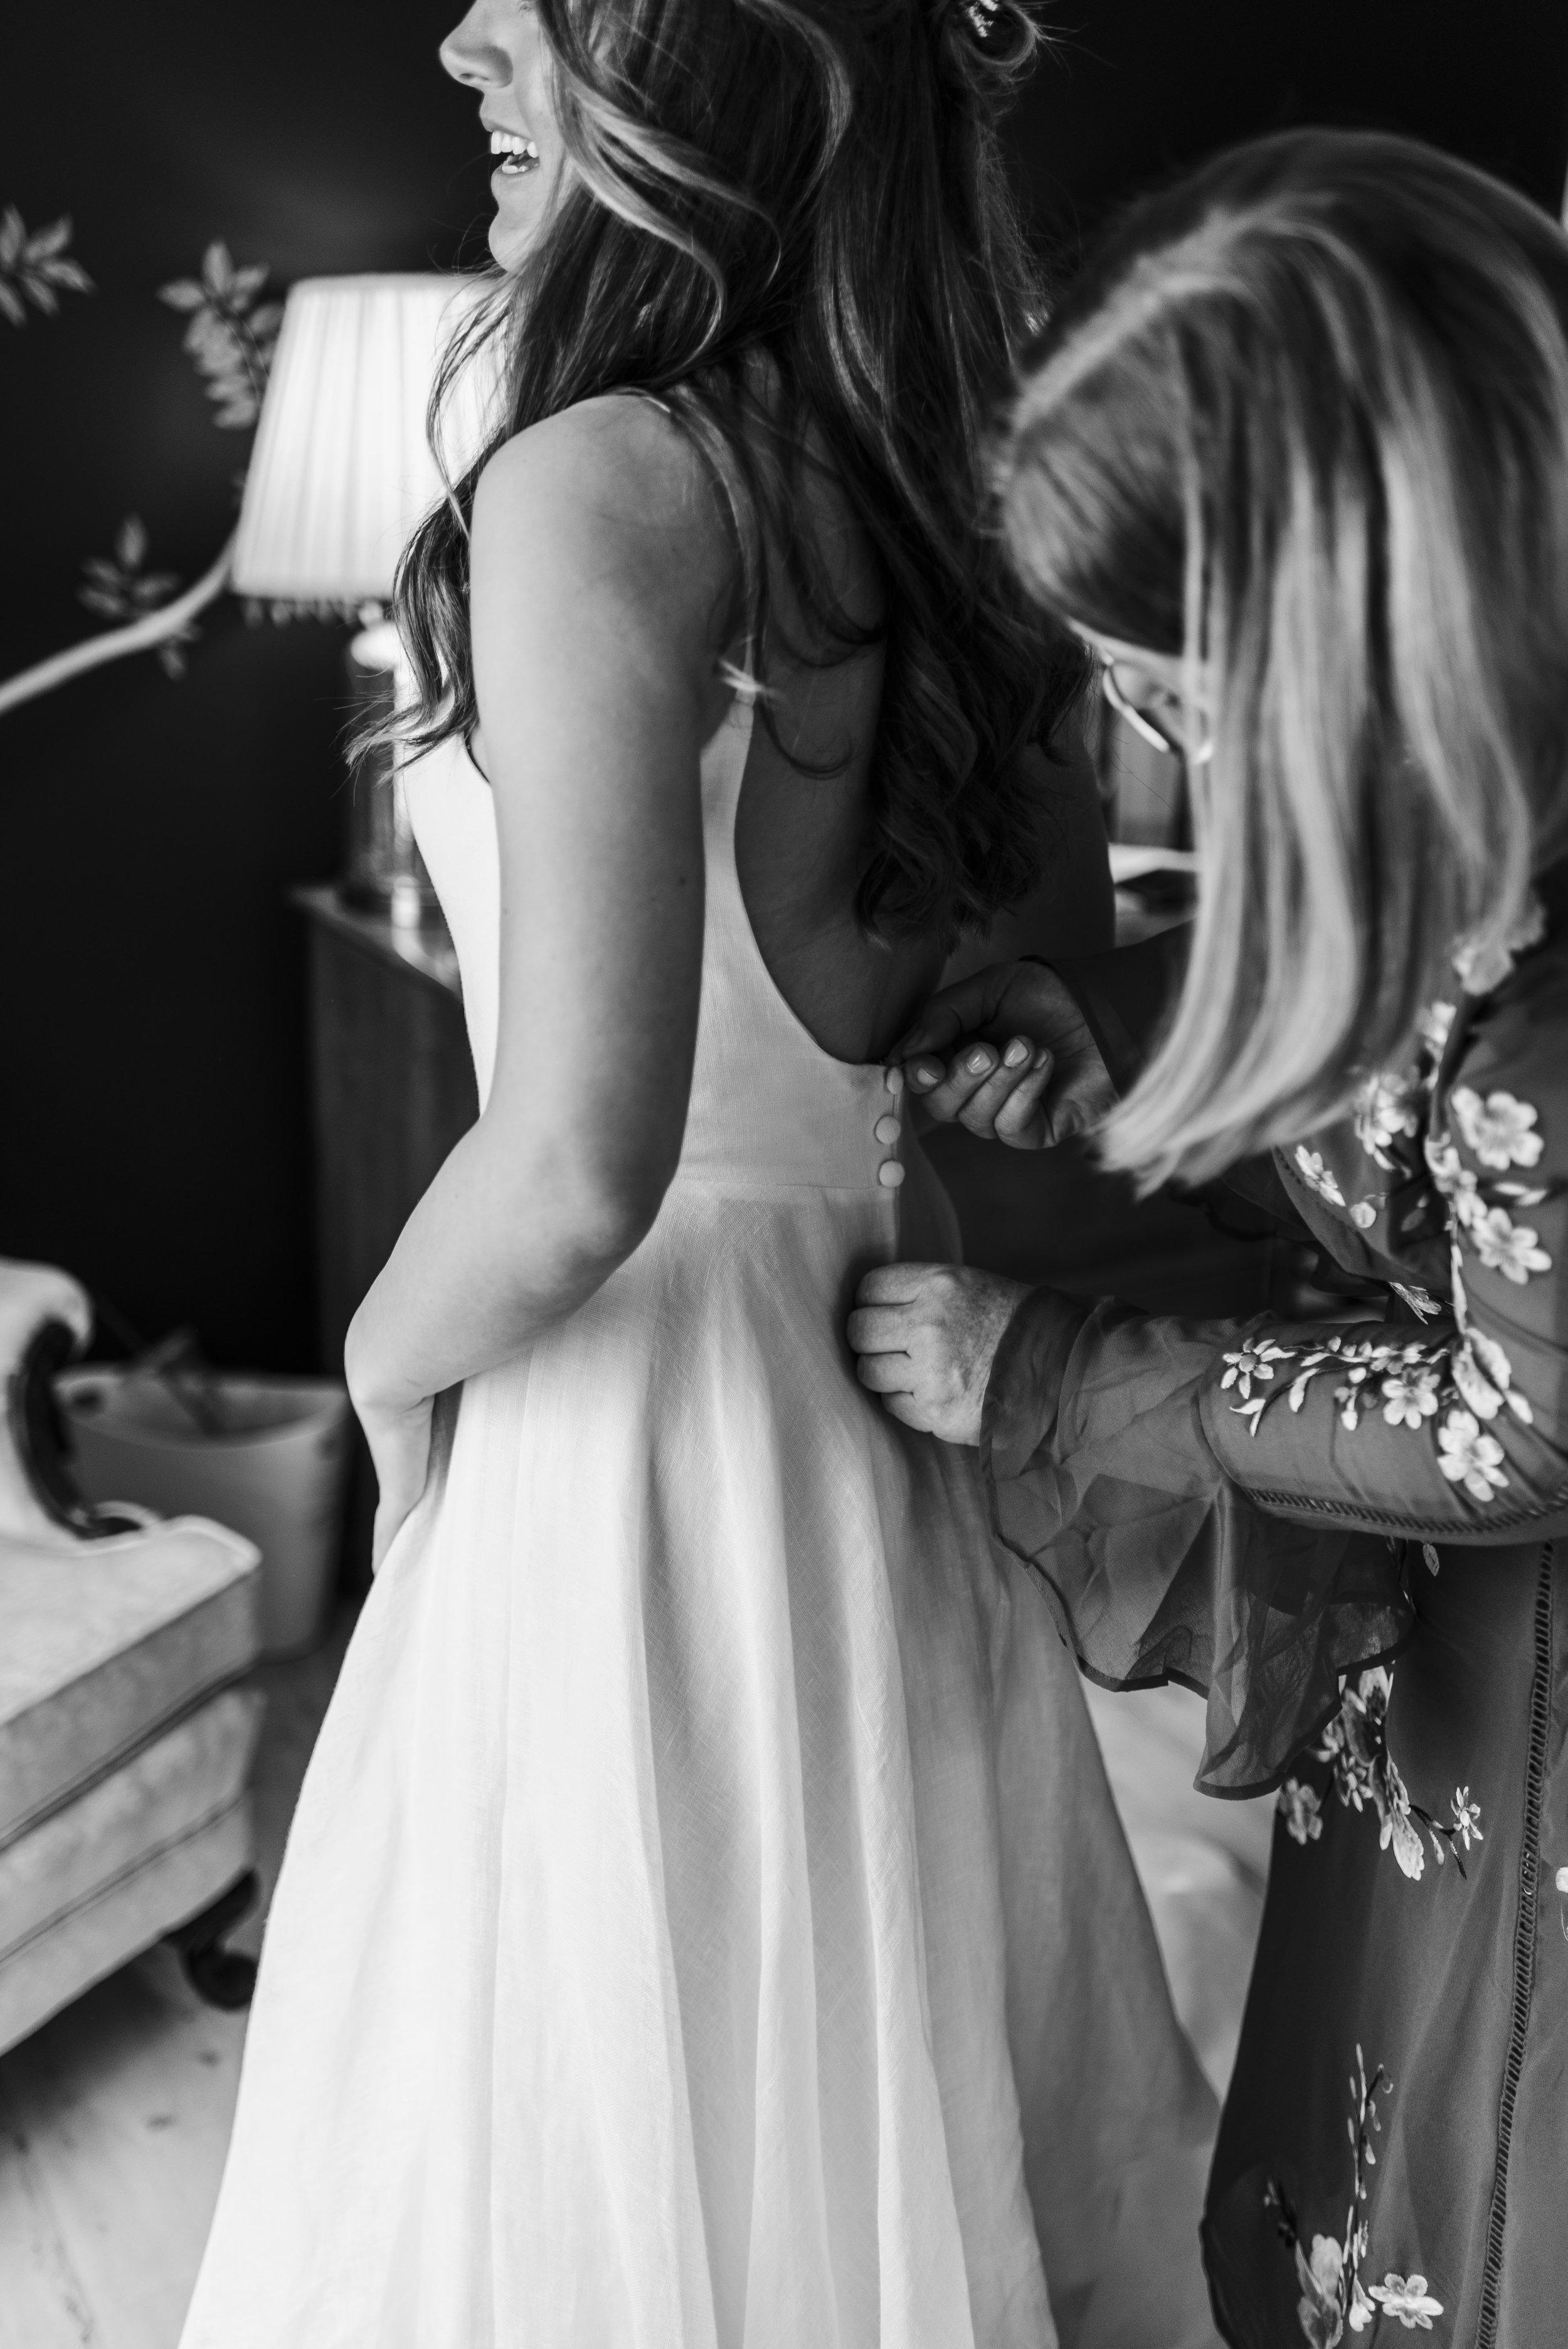 wedding bride dress chattanooga Tennessee